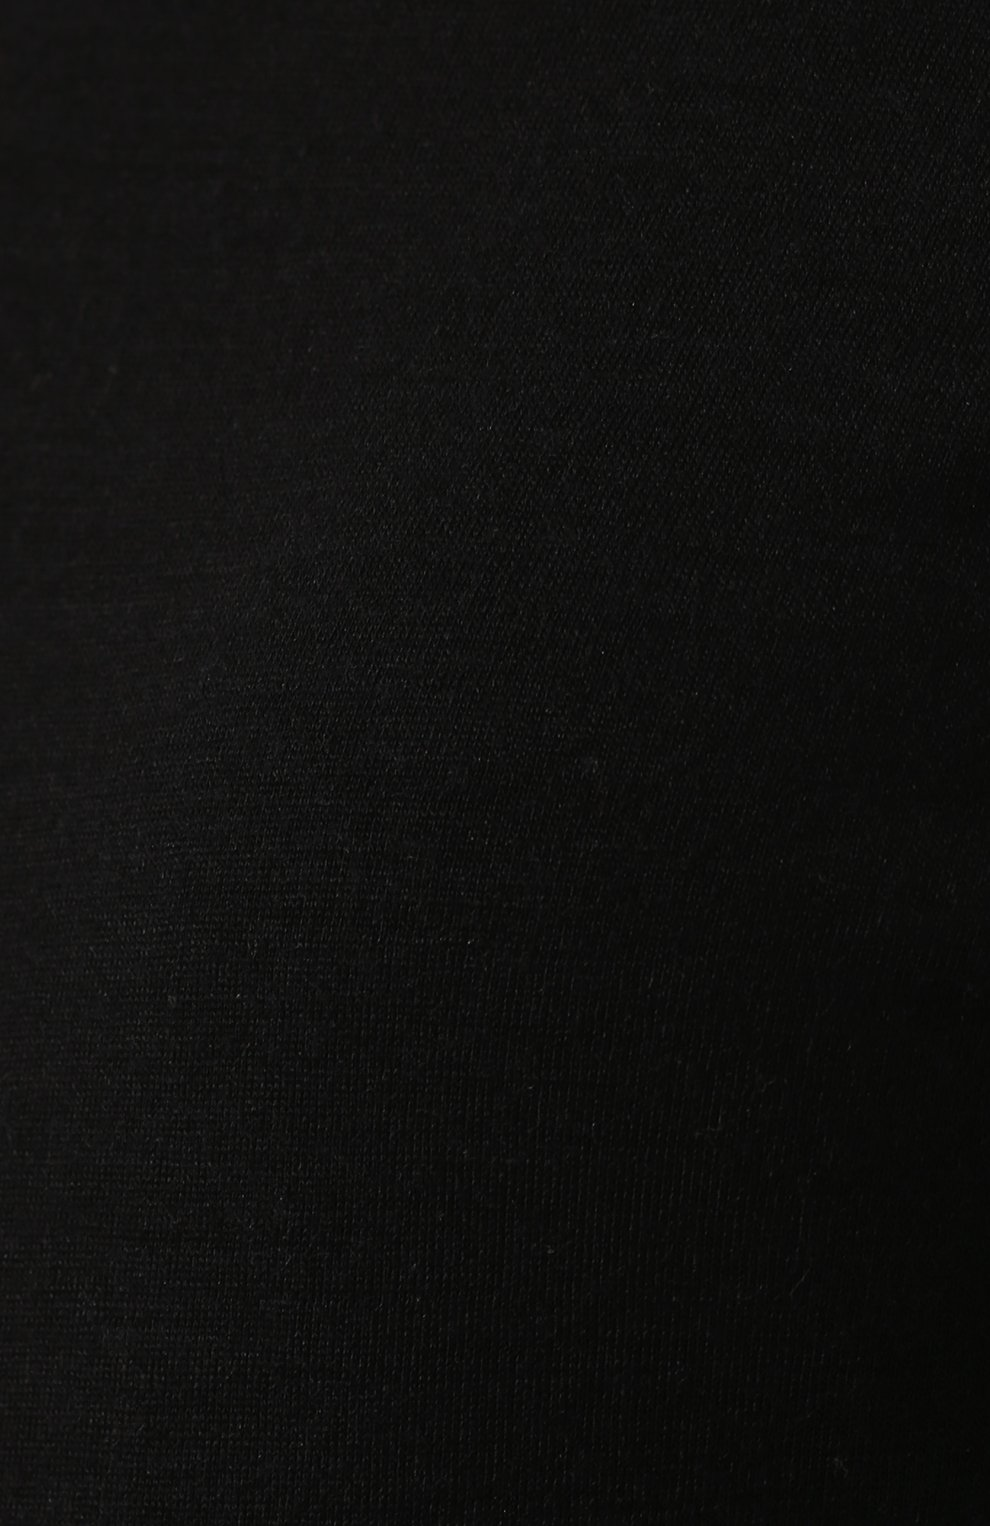 Однотонная водолазка на молнии BOSS черная | Фото №5